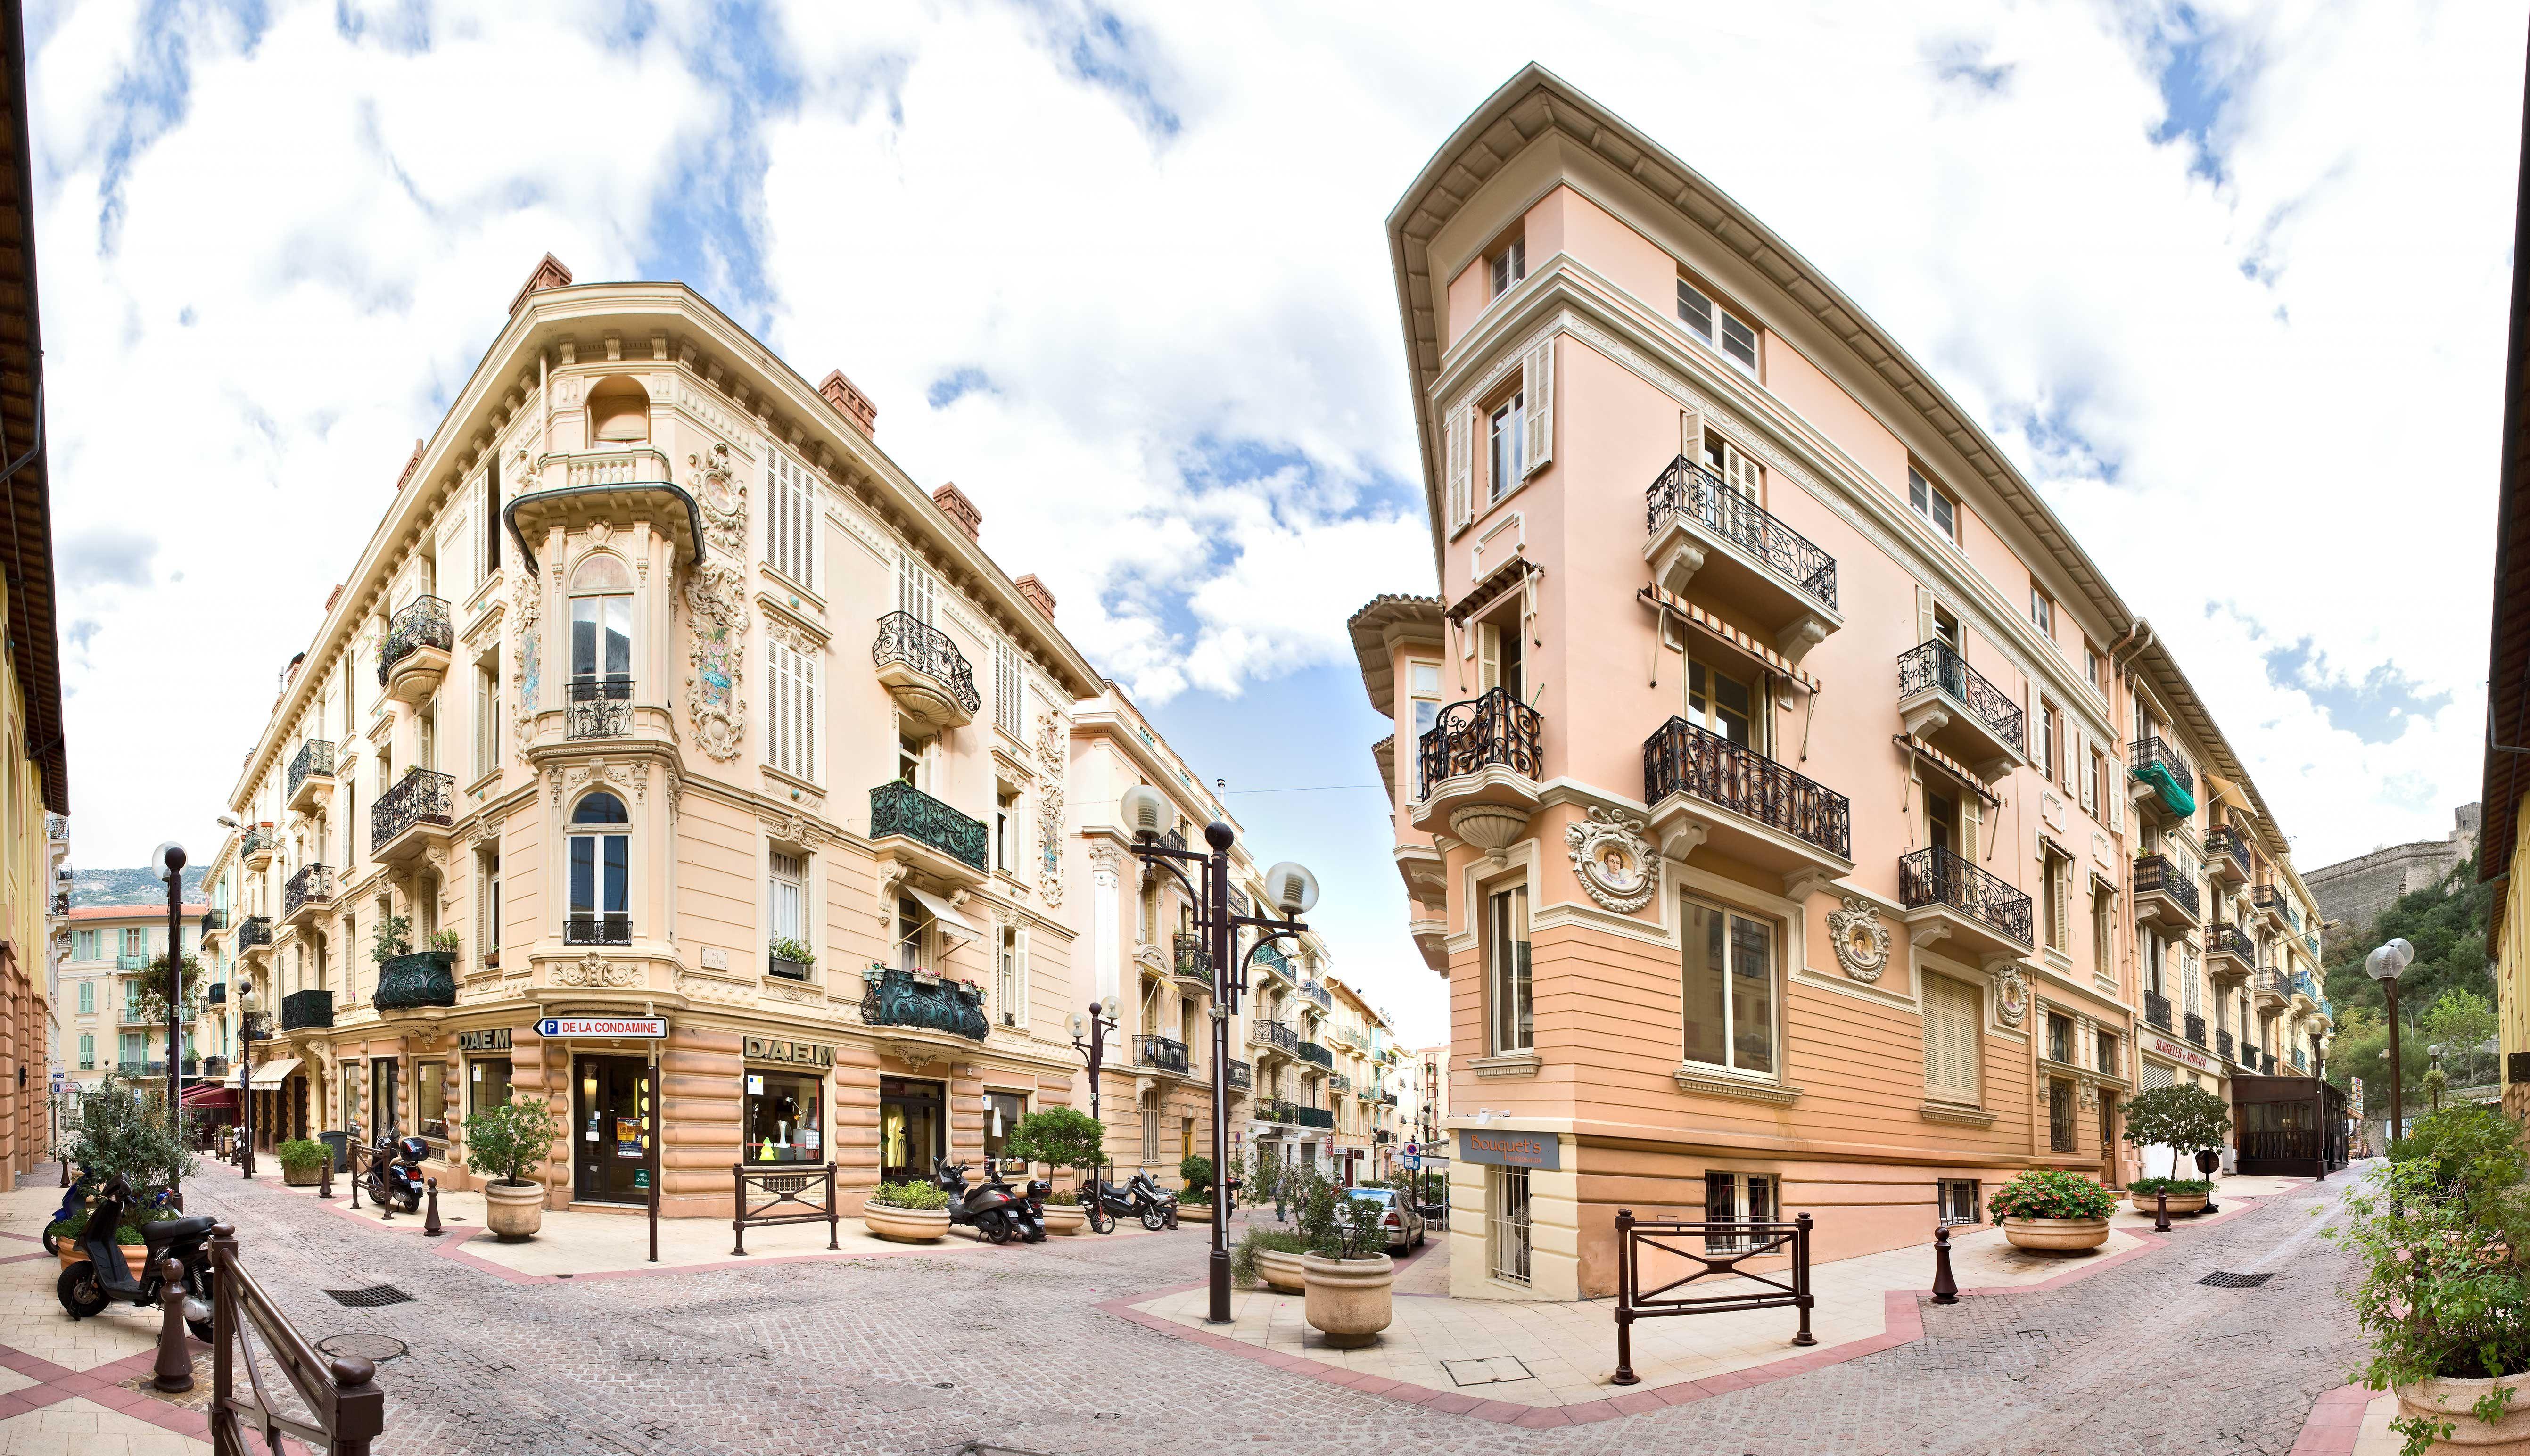 Rue Terrazzani & Rue of Açores, Monaco.  Note the Belle Époque ceramics on the buildings.